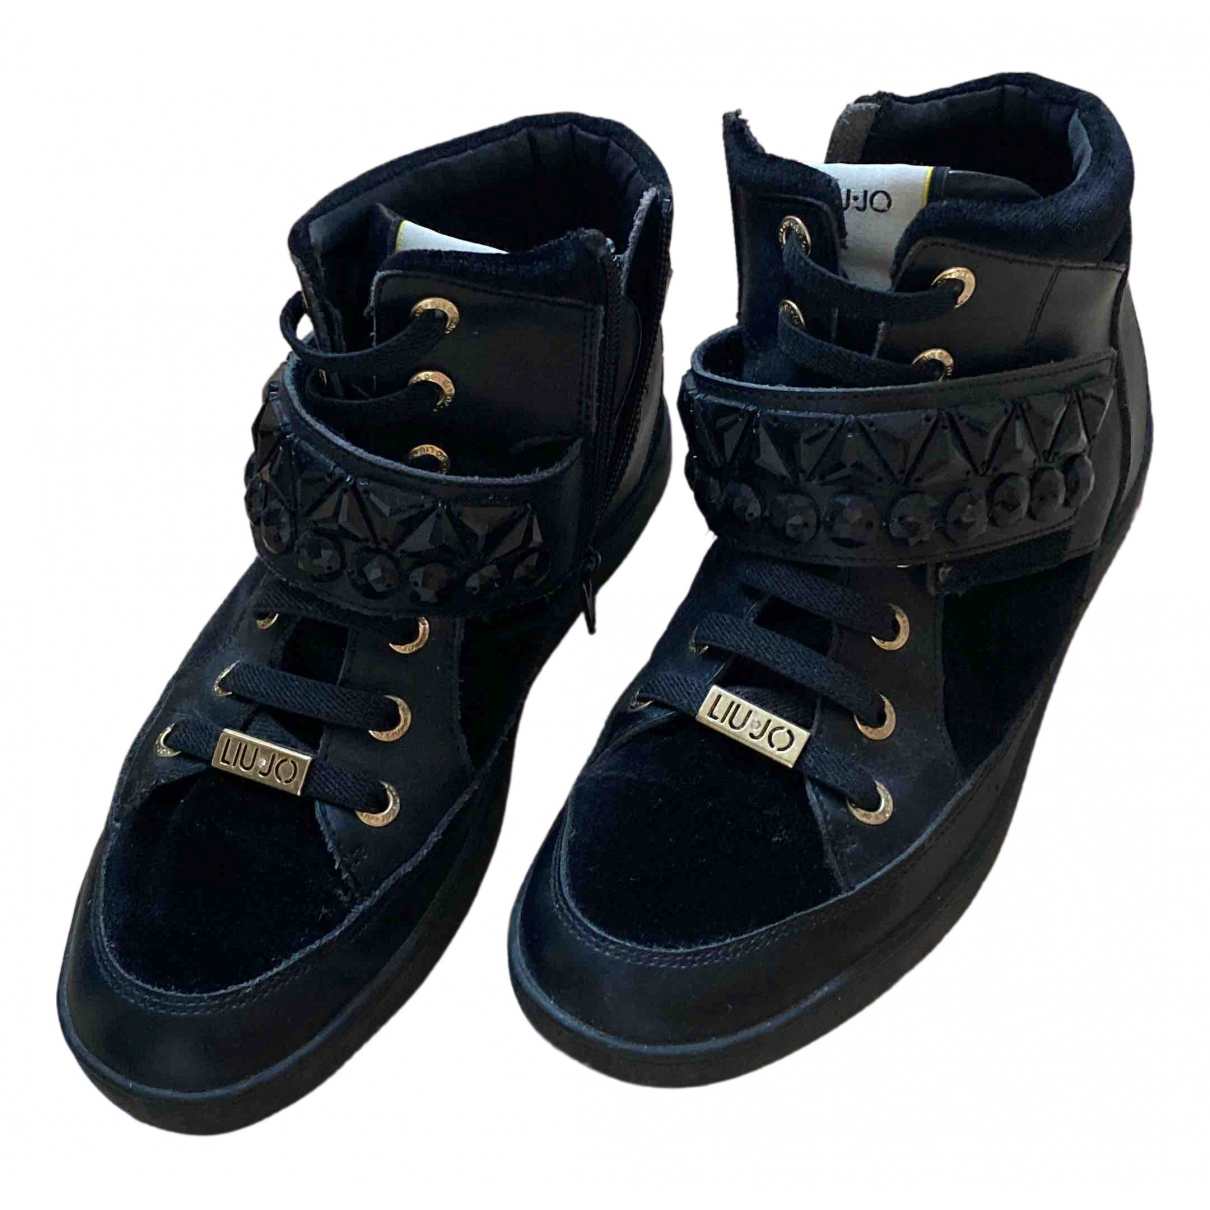 Liu.jo \N Sneakers in  Schwarz Samt